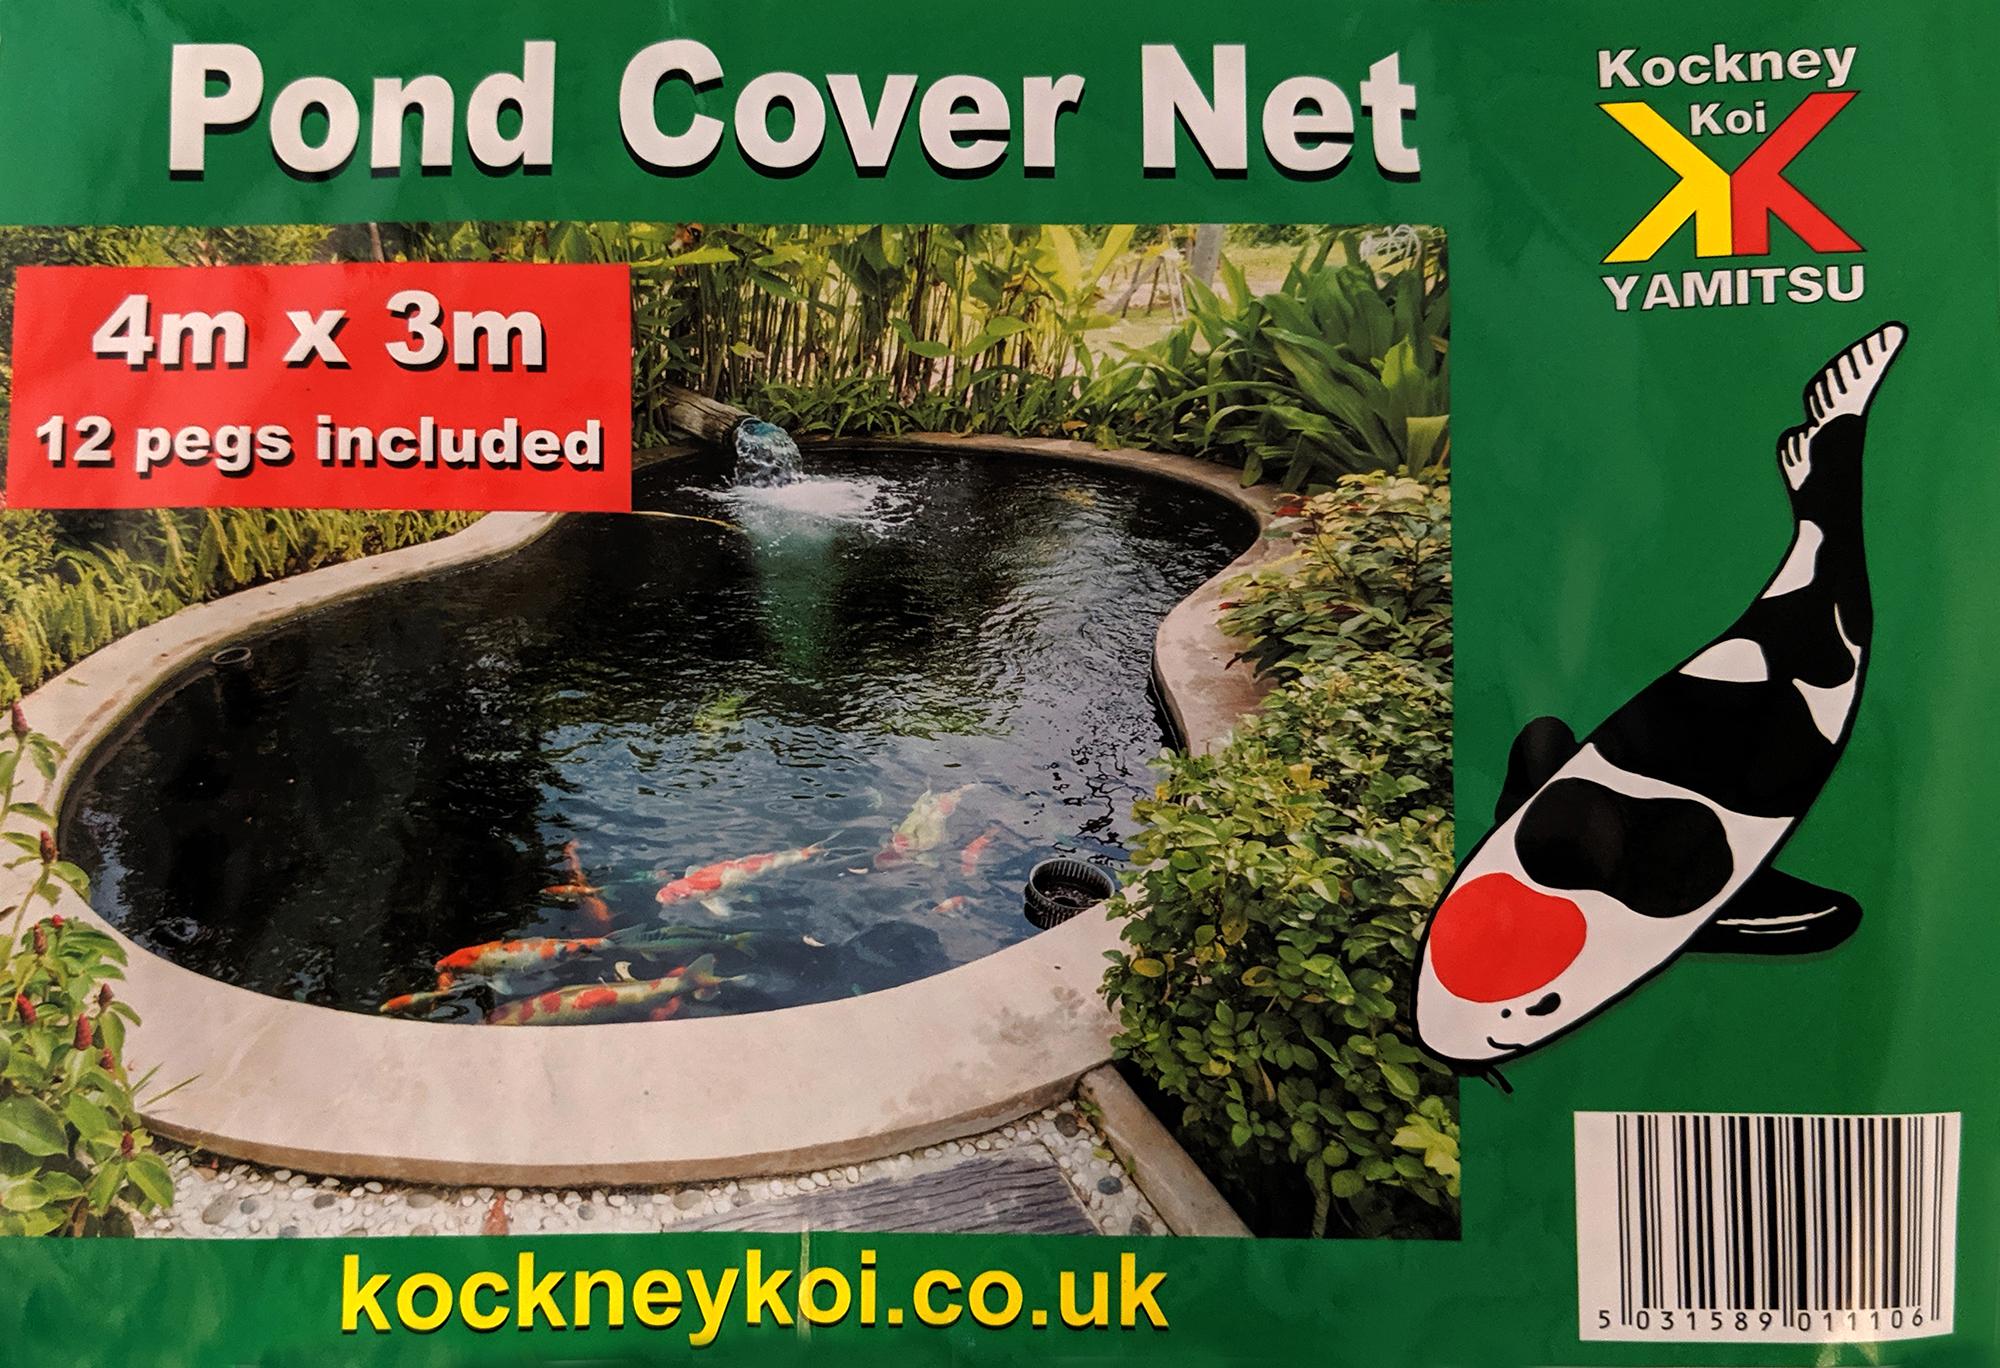 Pond Cover Net Pegs Garden Koi Fish Pond Pool Netting Heron Fox Protector